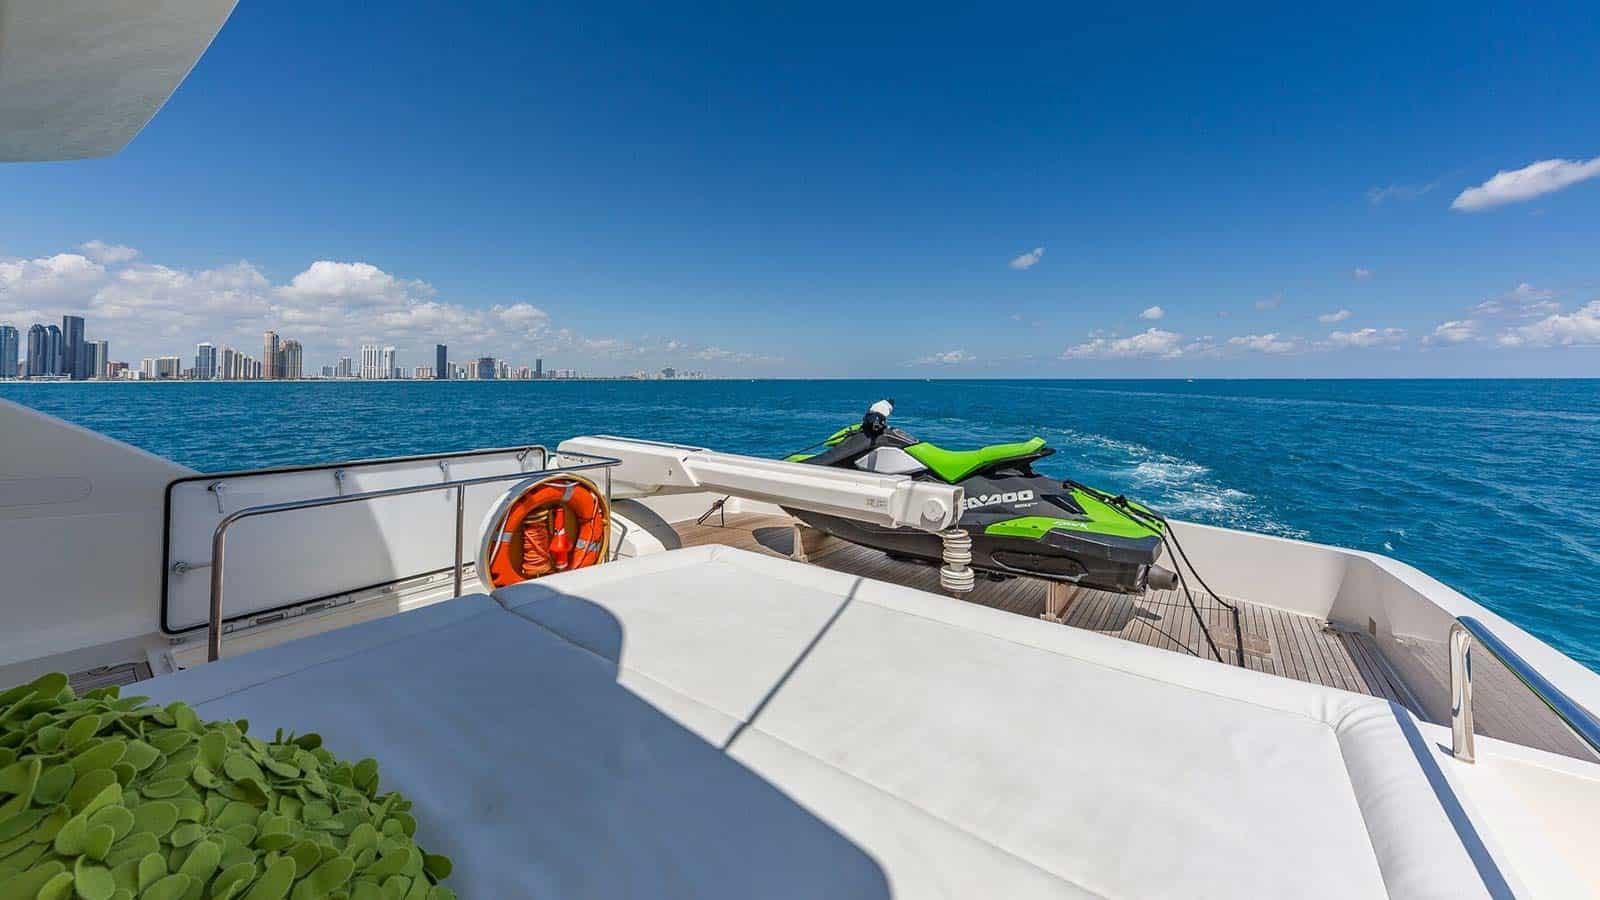 Miami In Water Boat Show